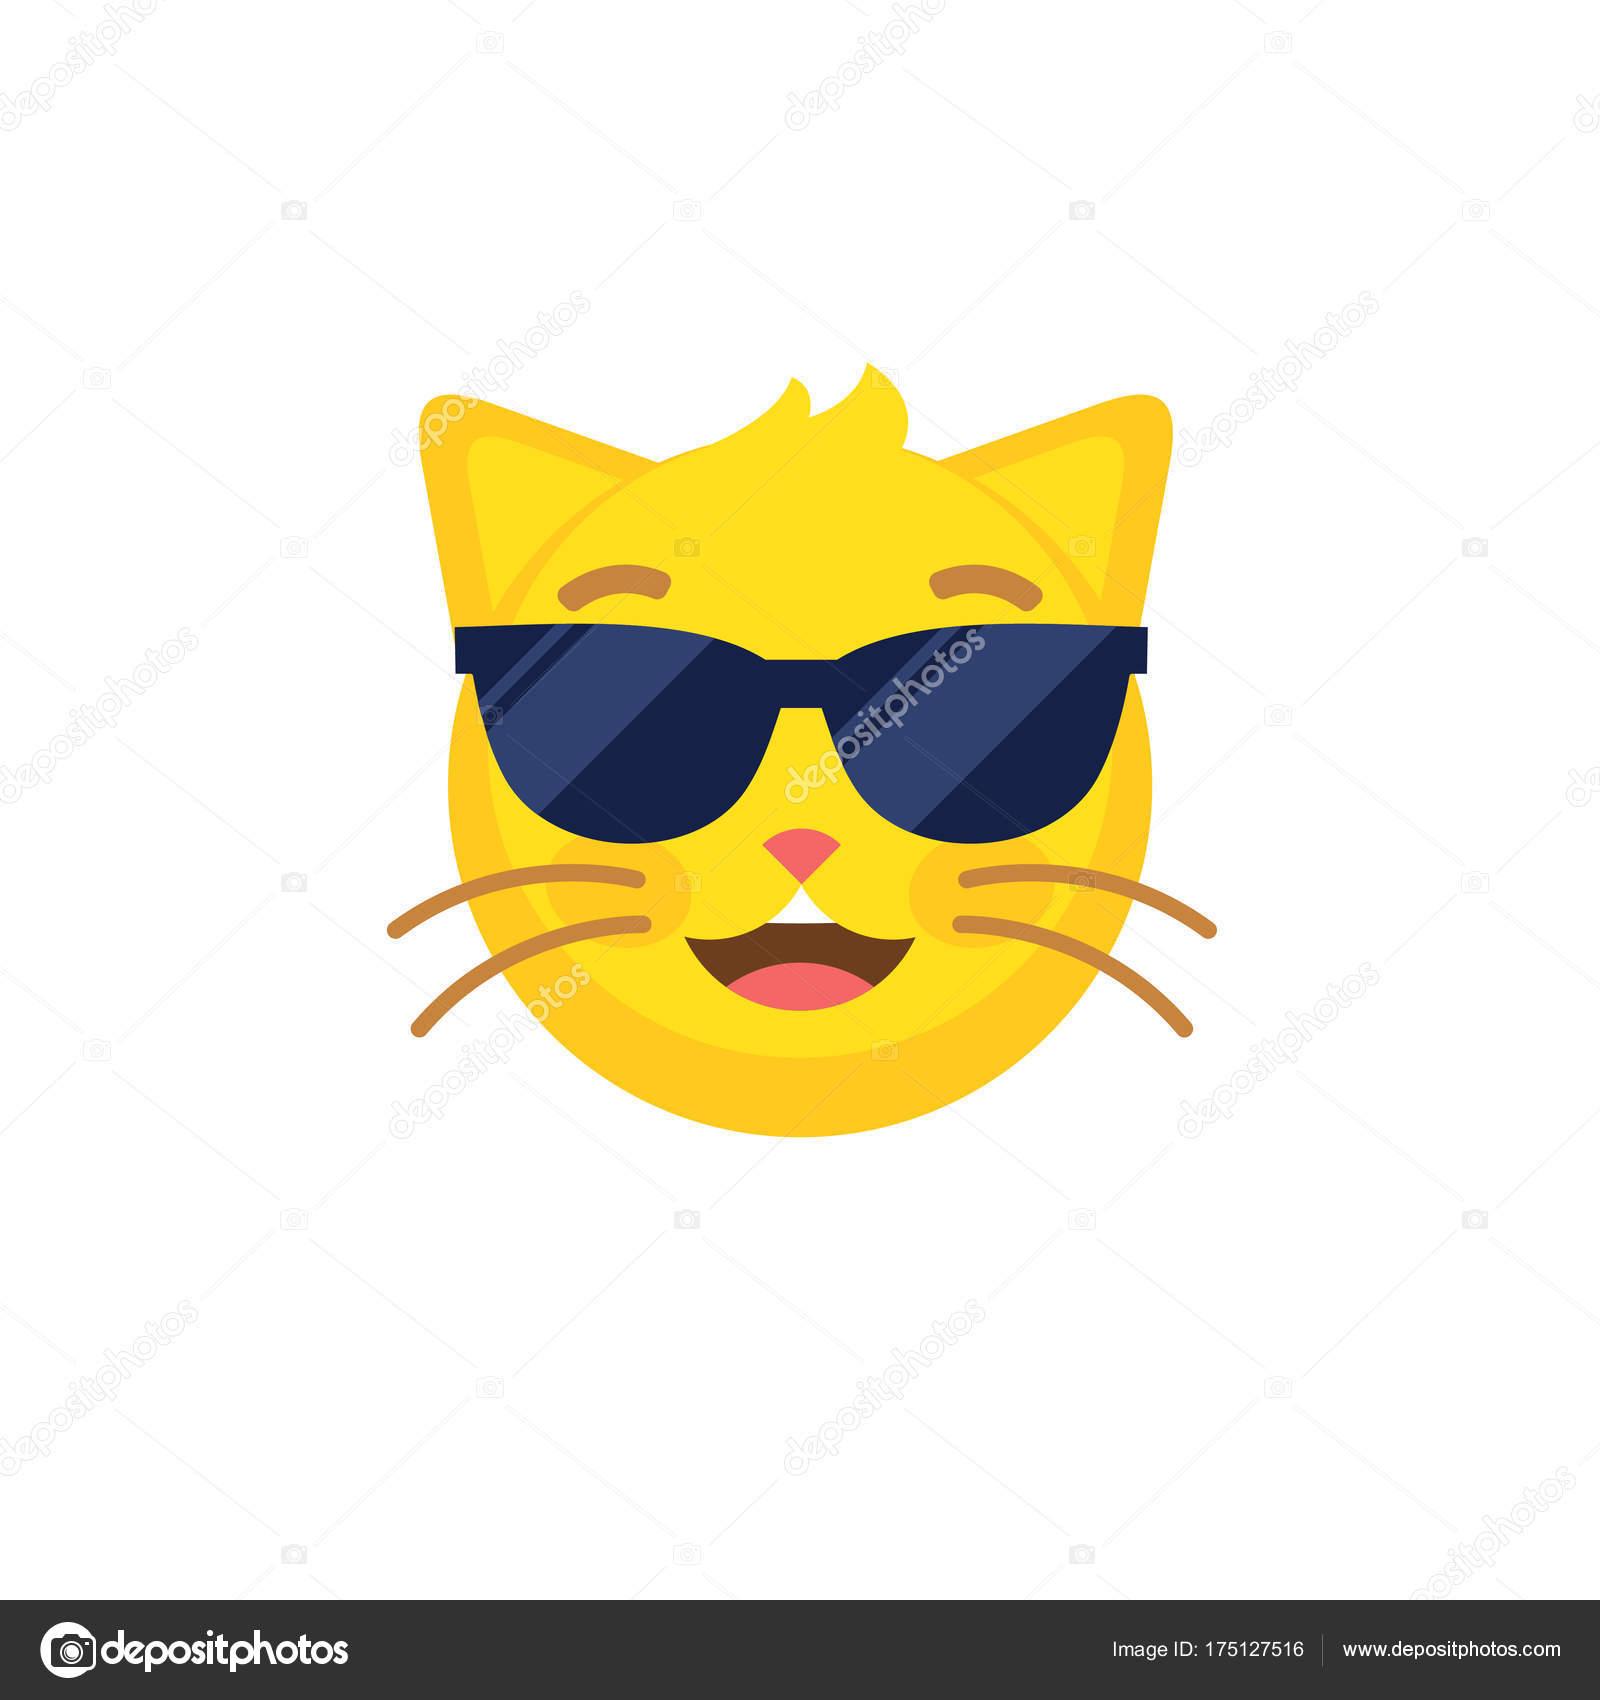 Gracioso Icono Estilo Plano Resumen Gato En Emoticon Emoji De rothxBsQdC